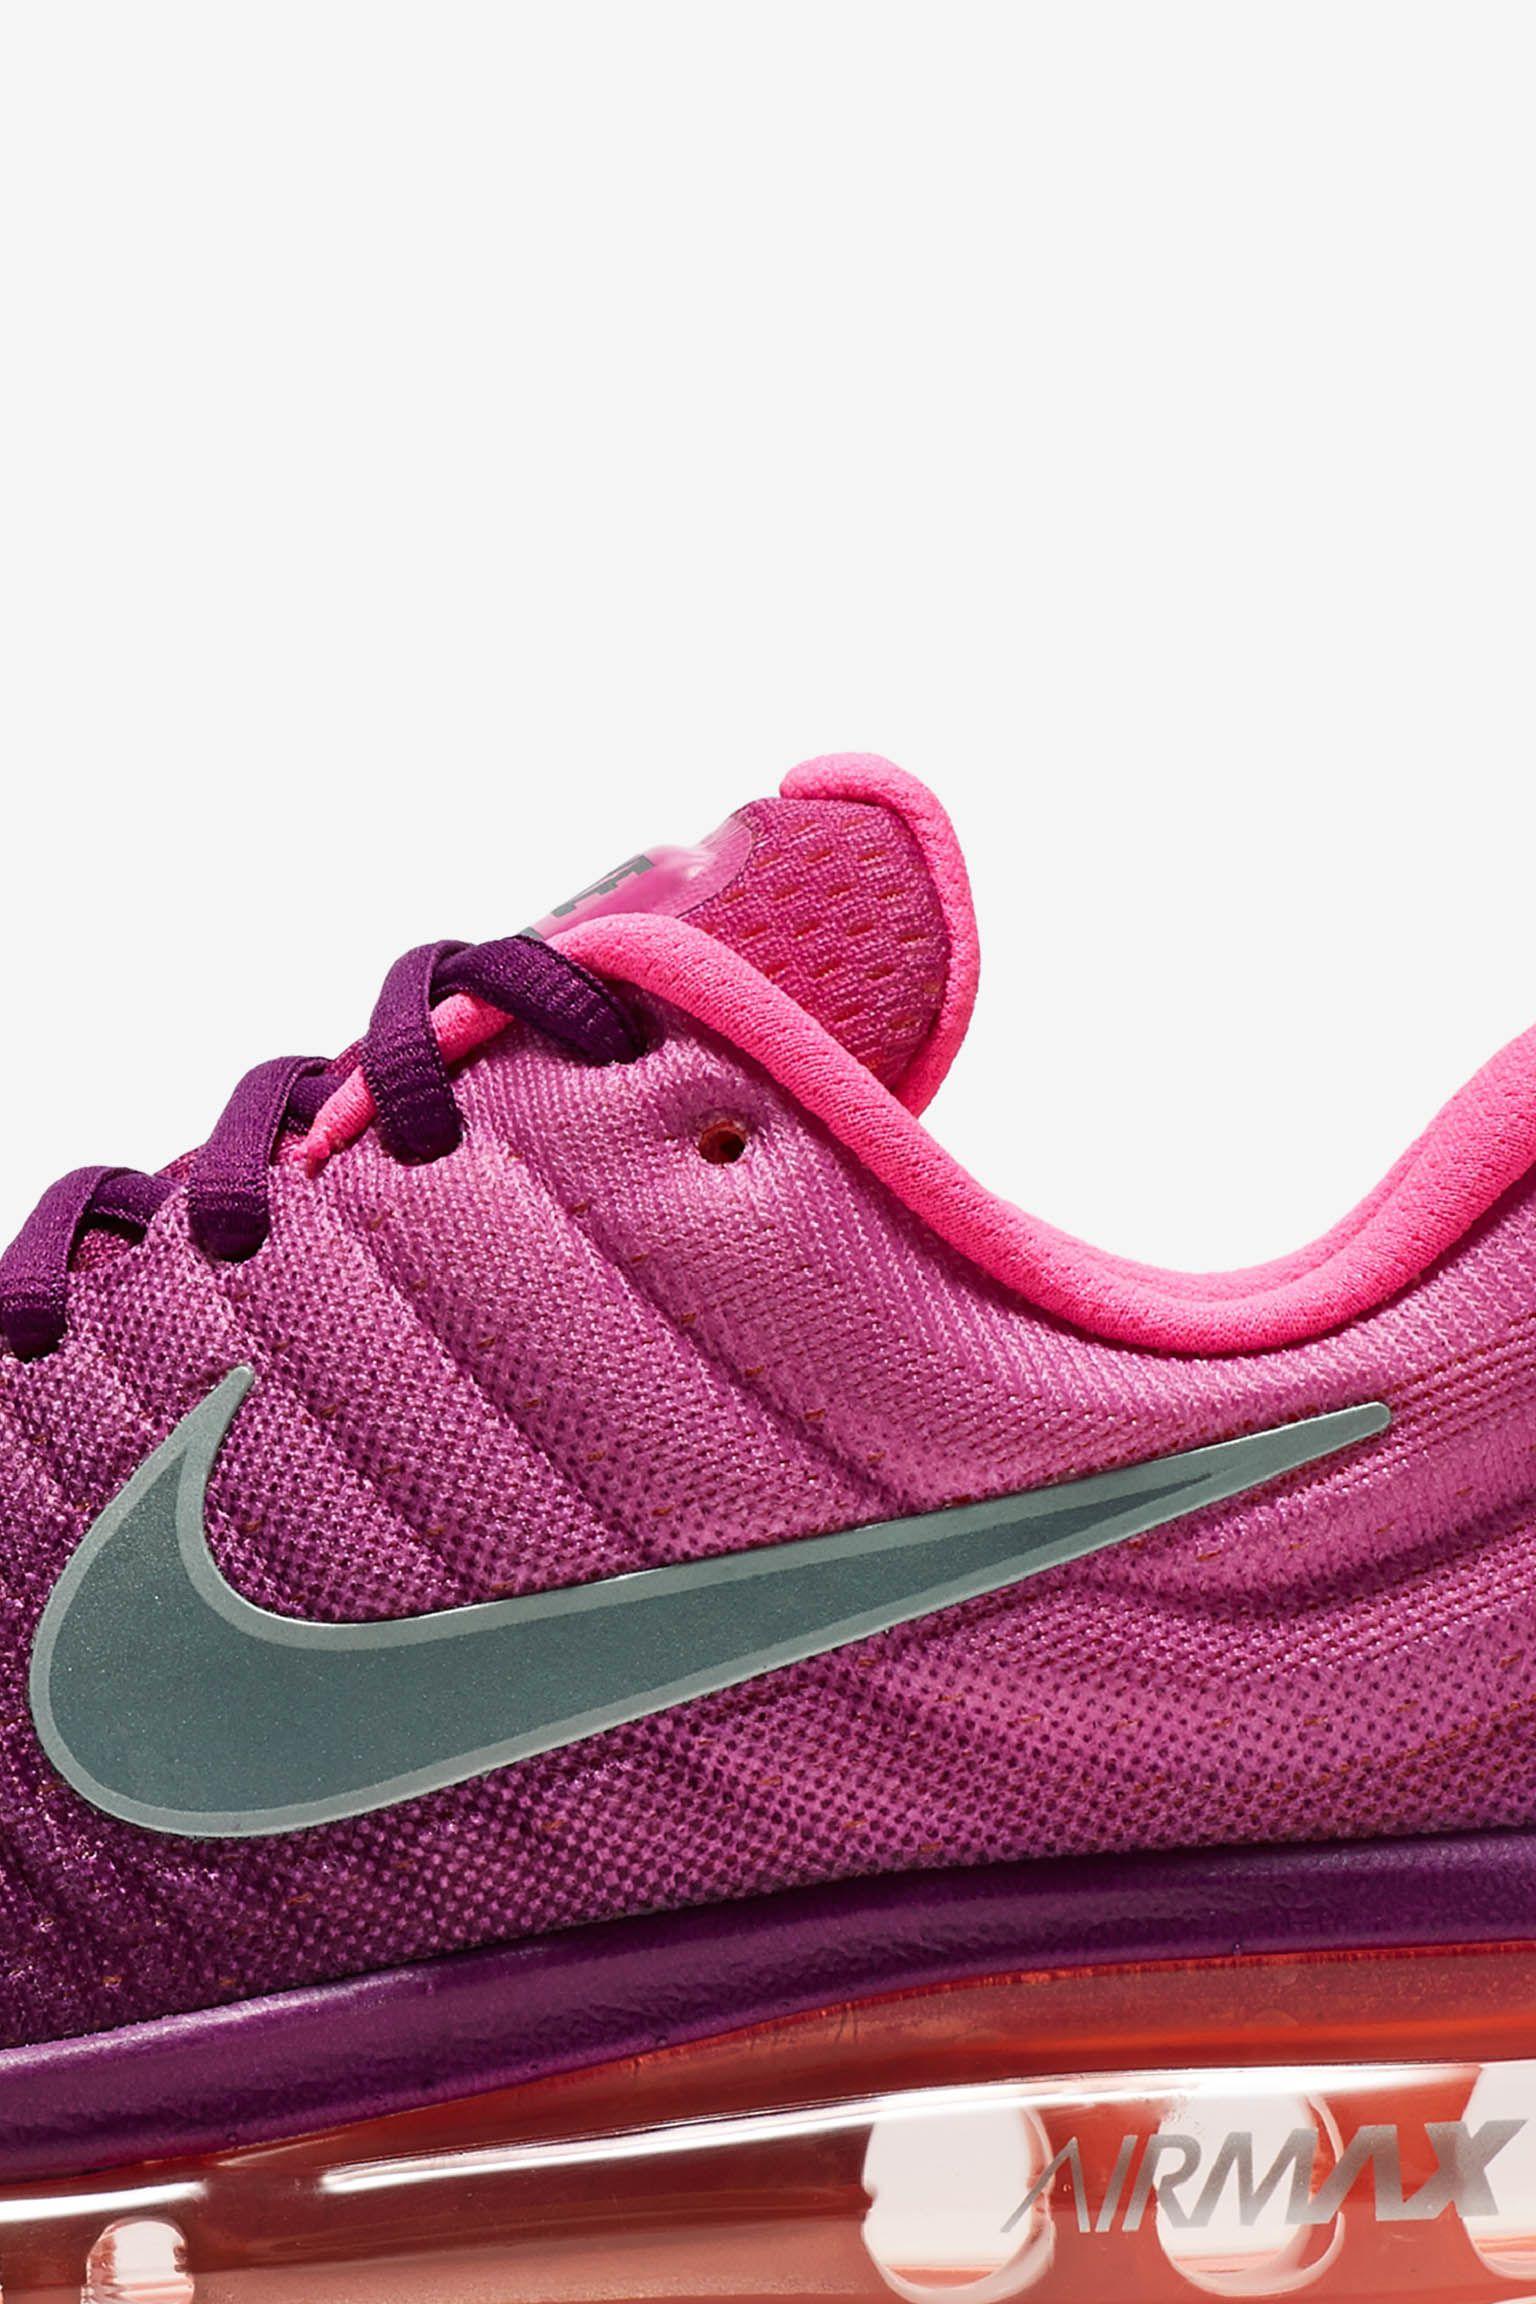 Nike Air Max 2017 'Bright Grape' til kvinder. Lanceringsdato